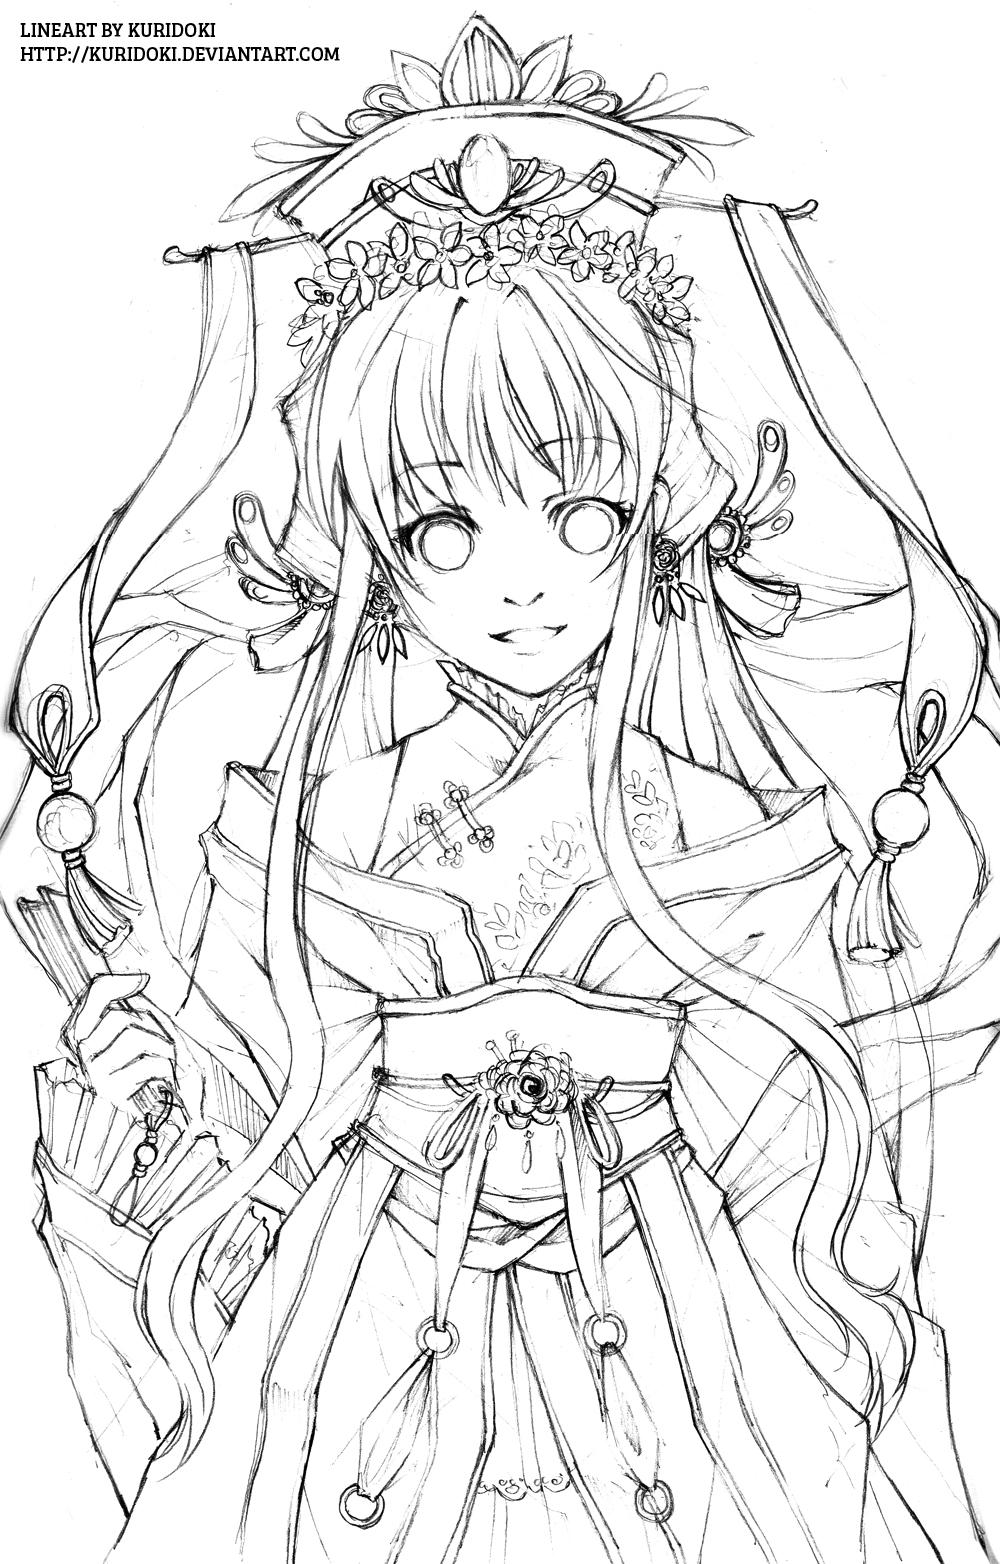 Hana-hime lineart by kuridoki